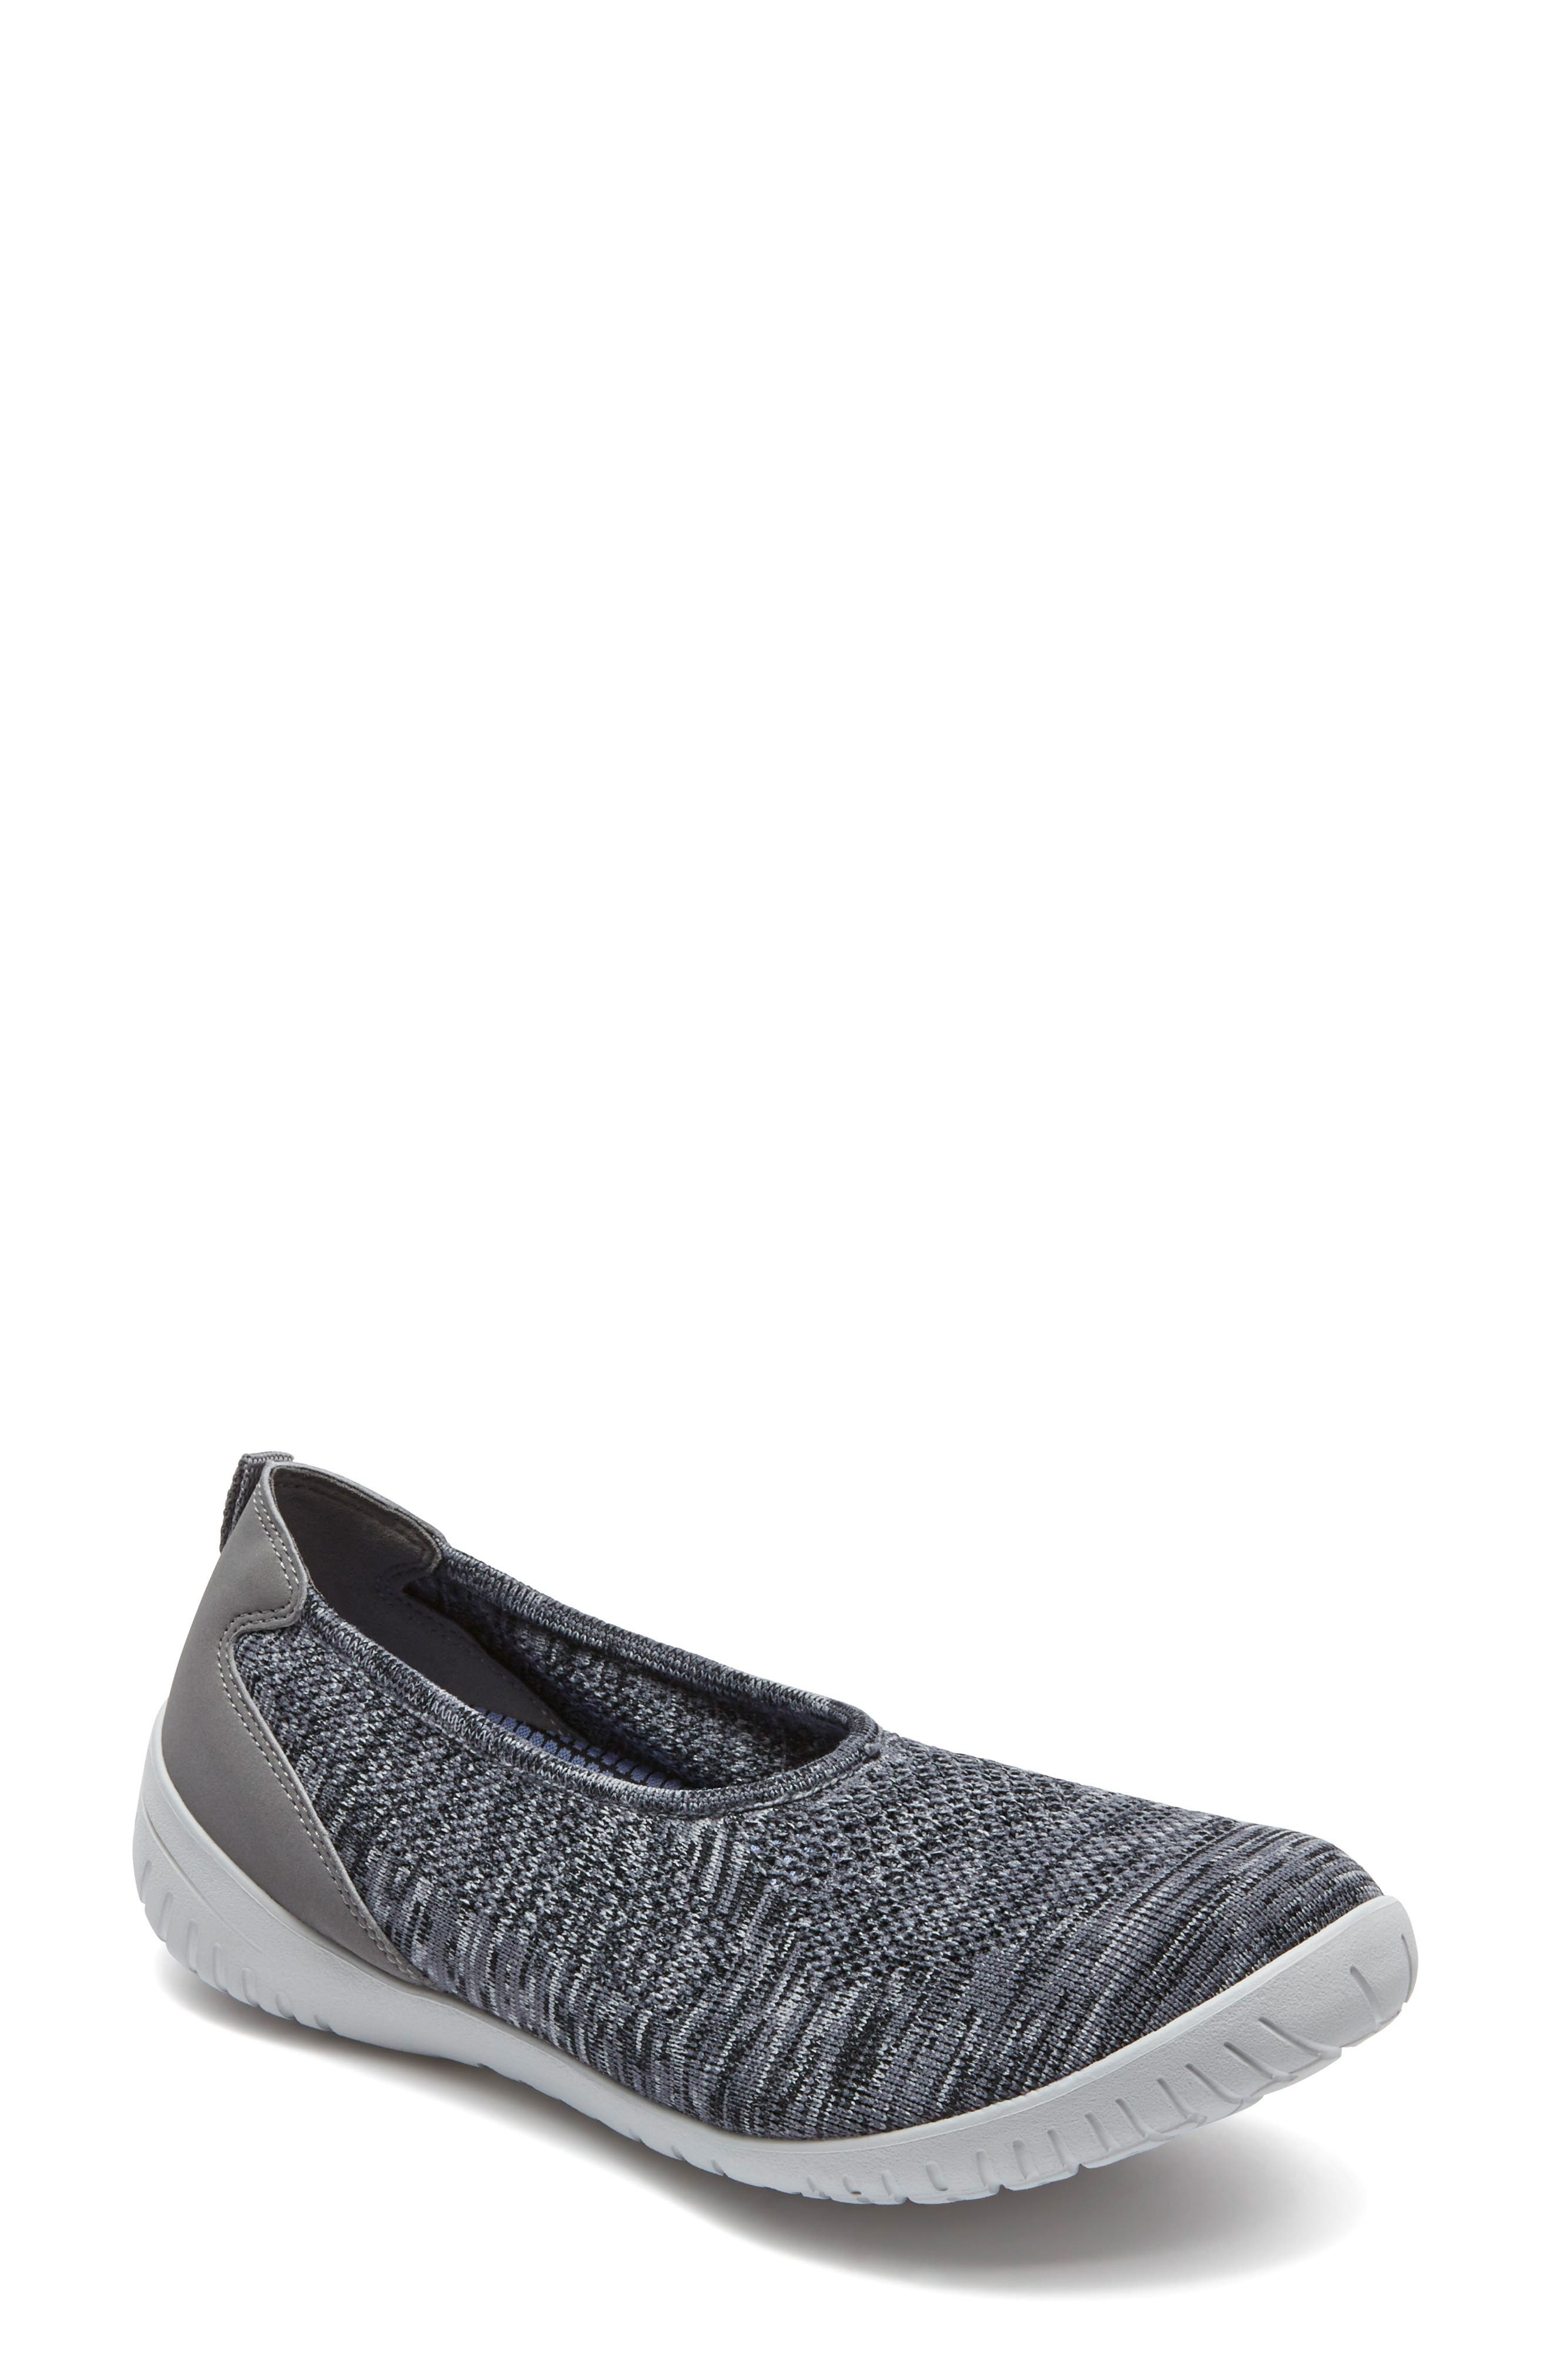 Raelyn Knit Ballet Sneaker,                             Main thumbnail 1, color,                             Dark Grey Heather Fabric